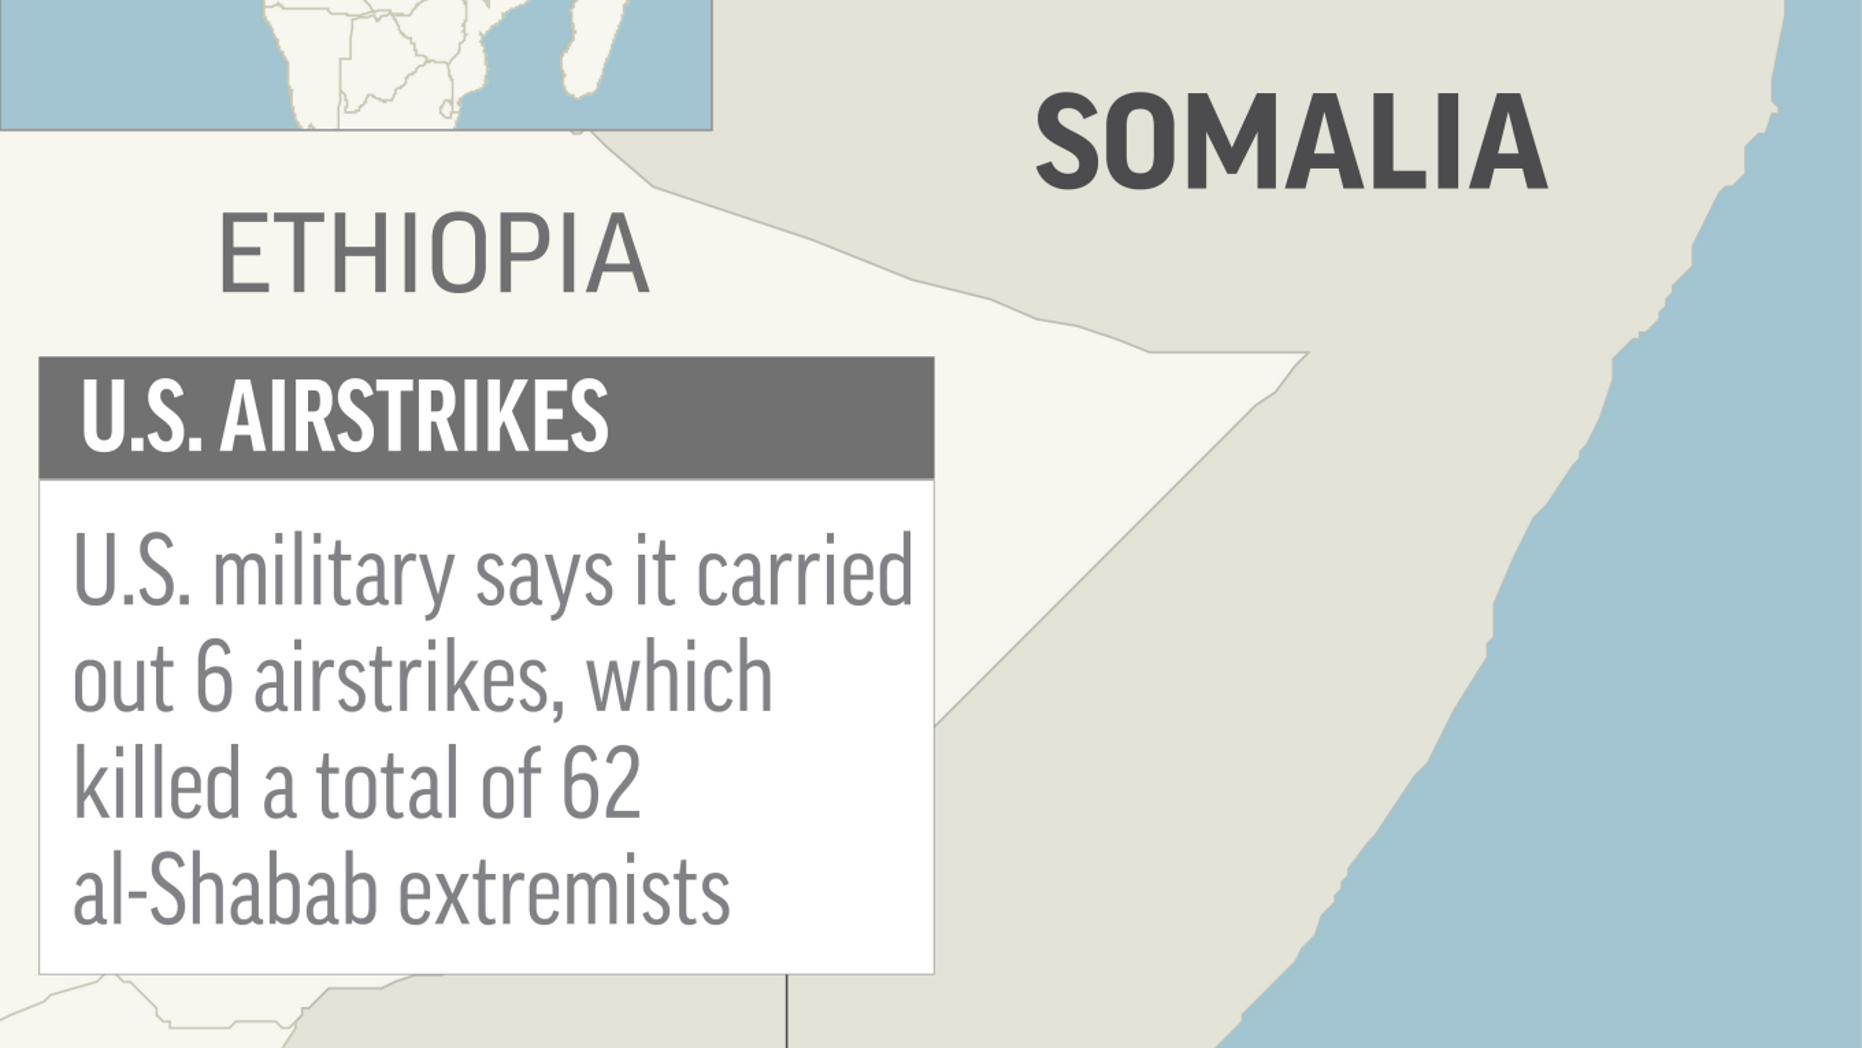 Map locates Gandarshe, Somalia, where U.S. airstrikes killed al-Shabab extremists; 2c x 4 1/2 inches; 96.3 mm x 114 mm;